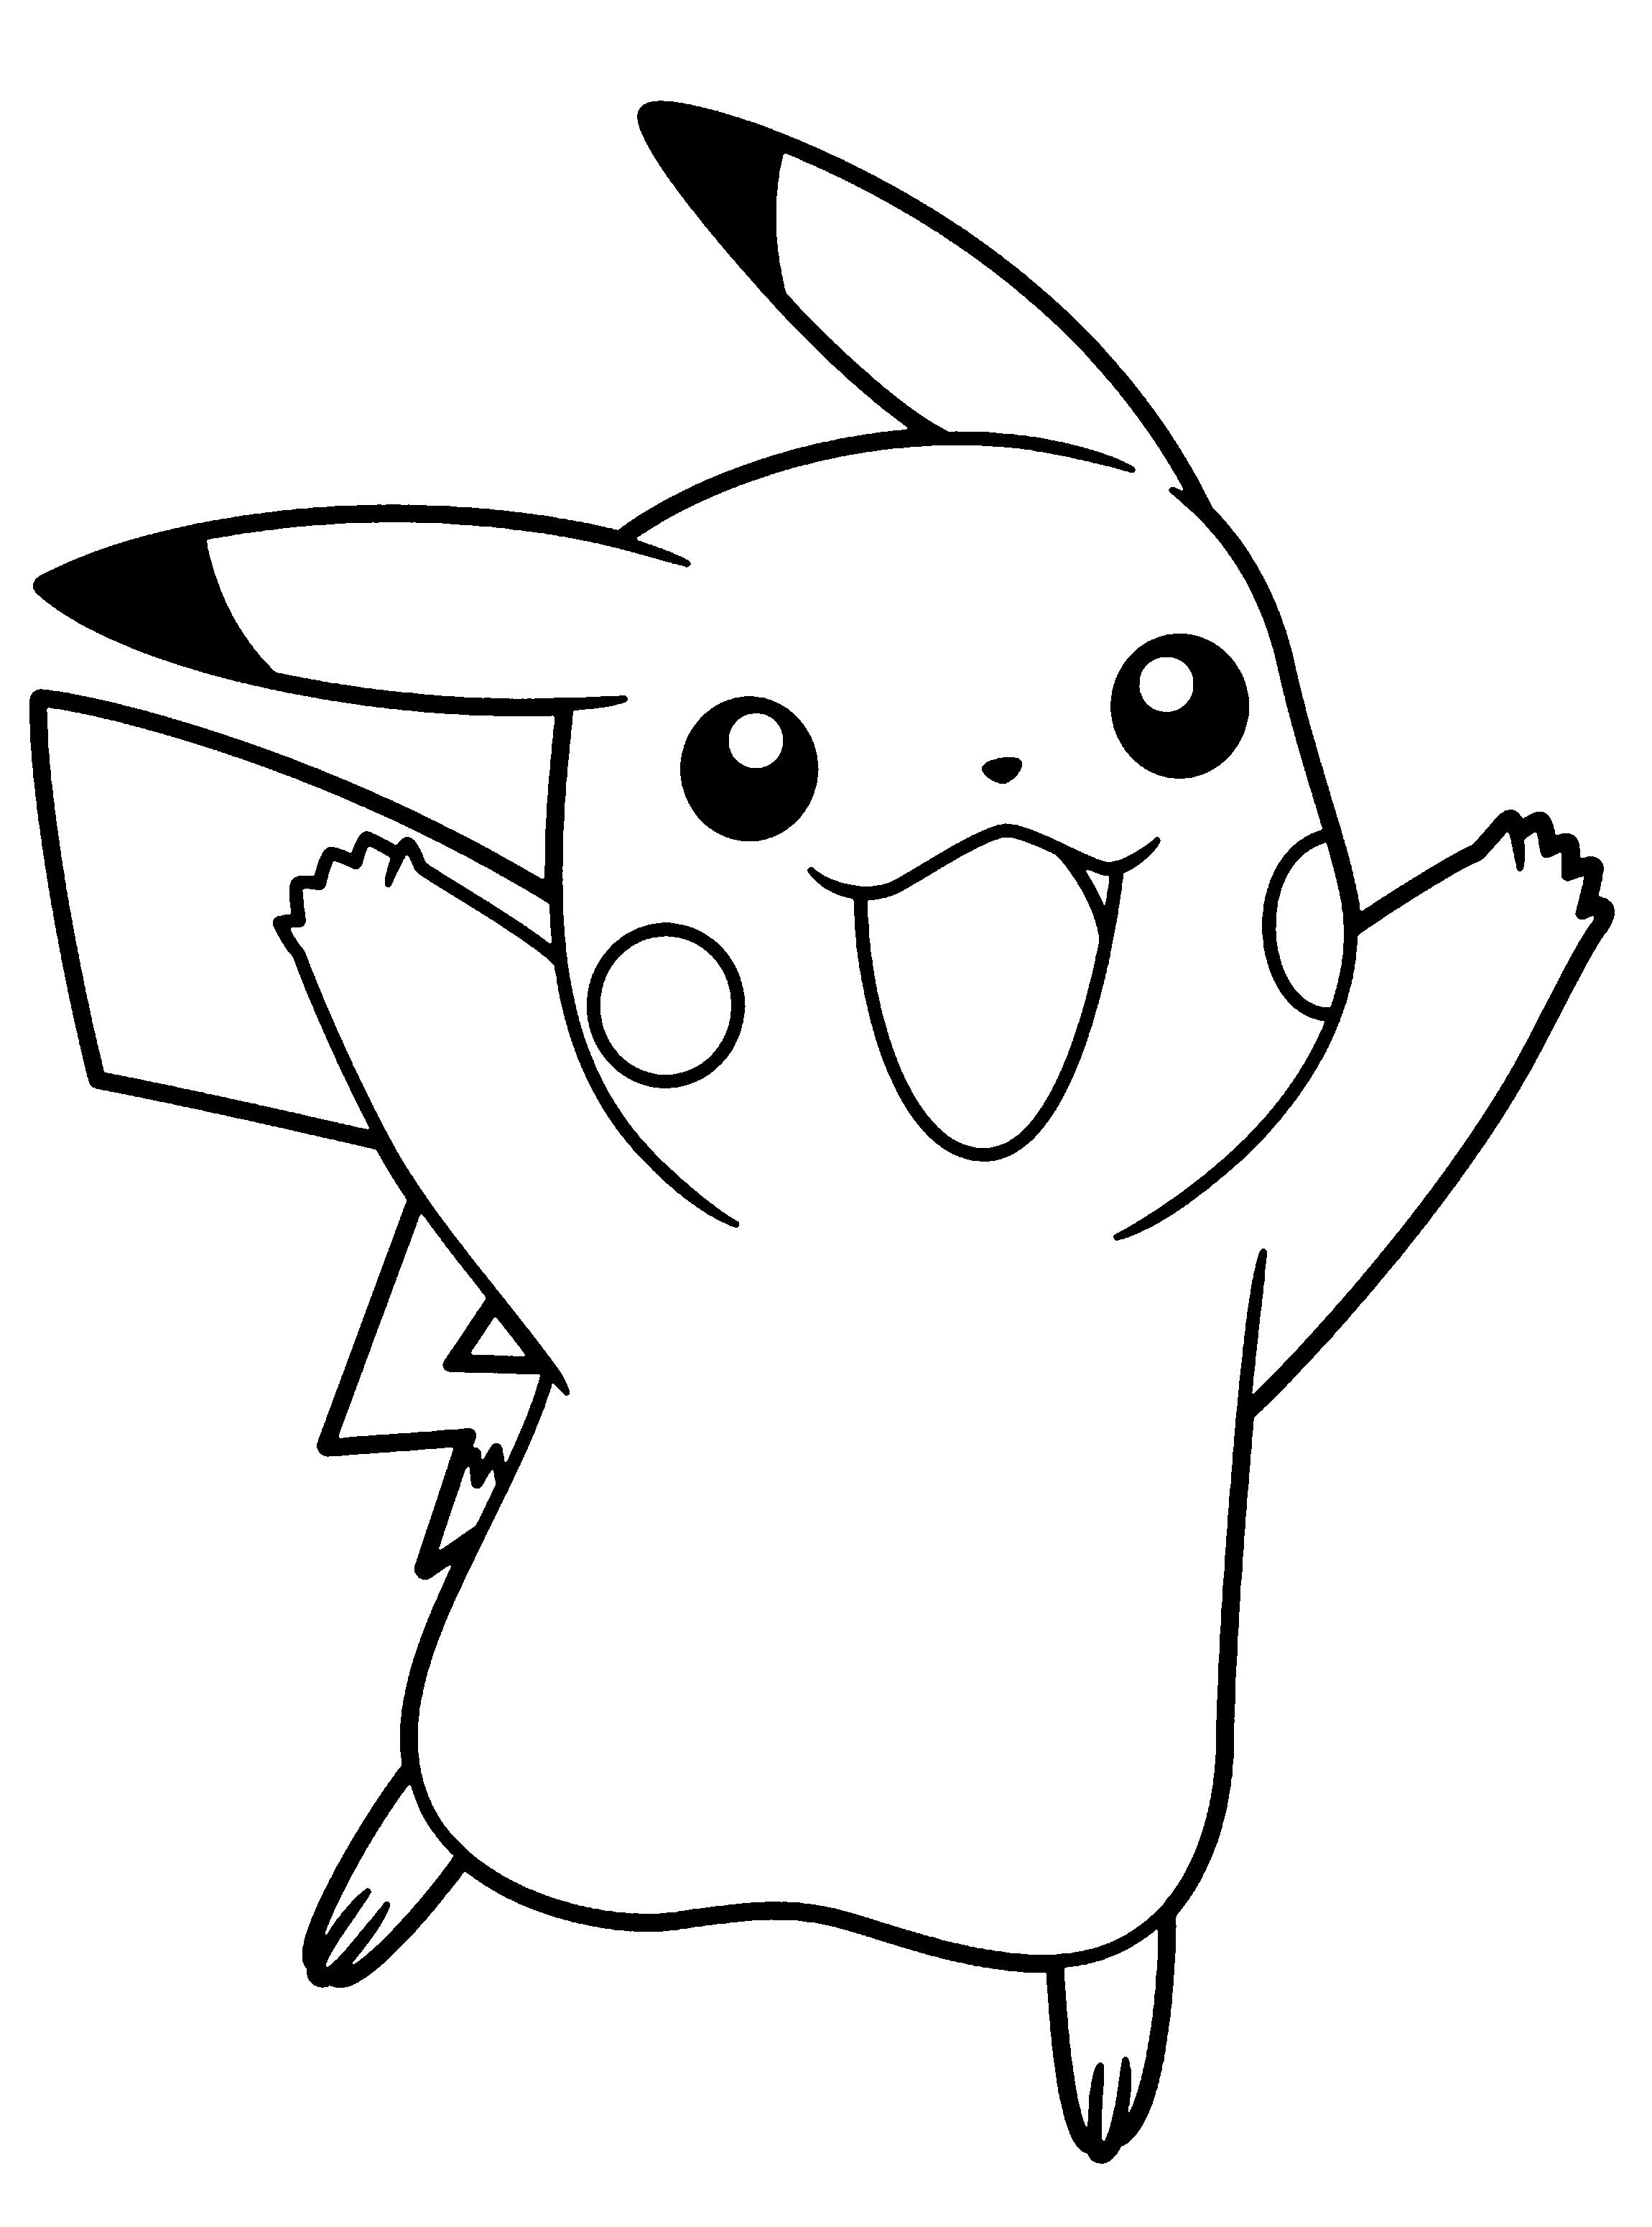 2300x3100 Pokemon Pikachu Coloring Pages Printable